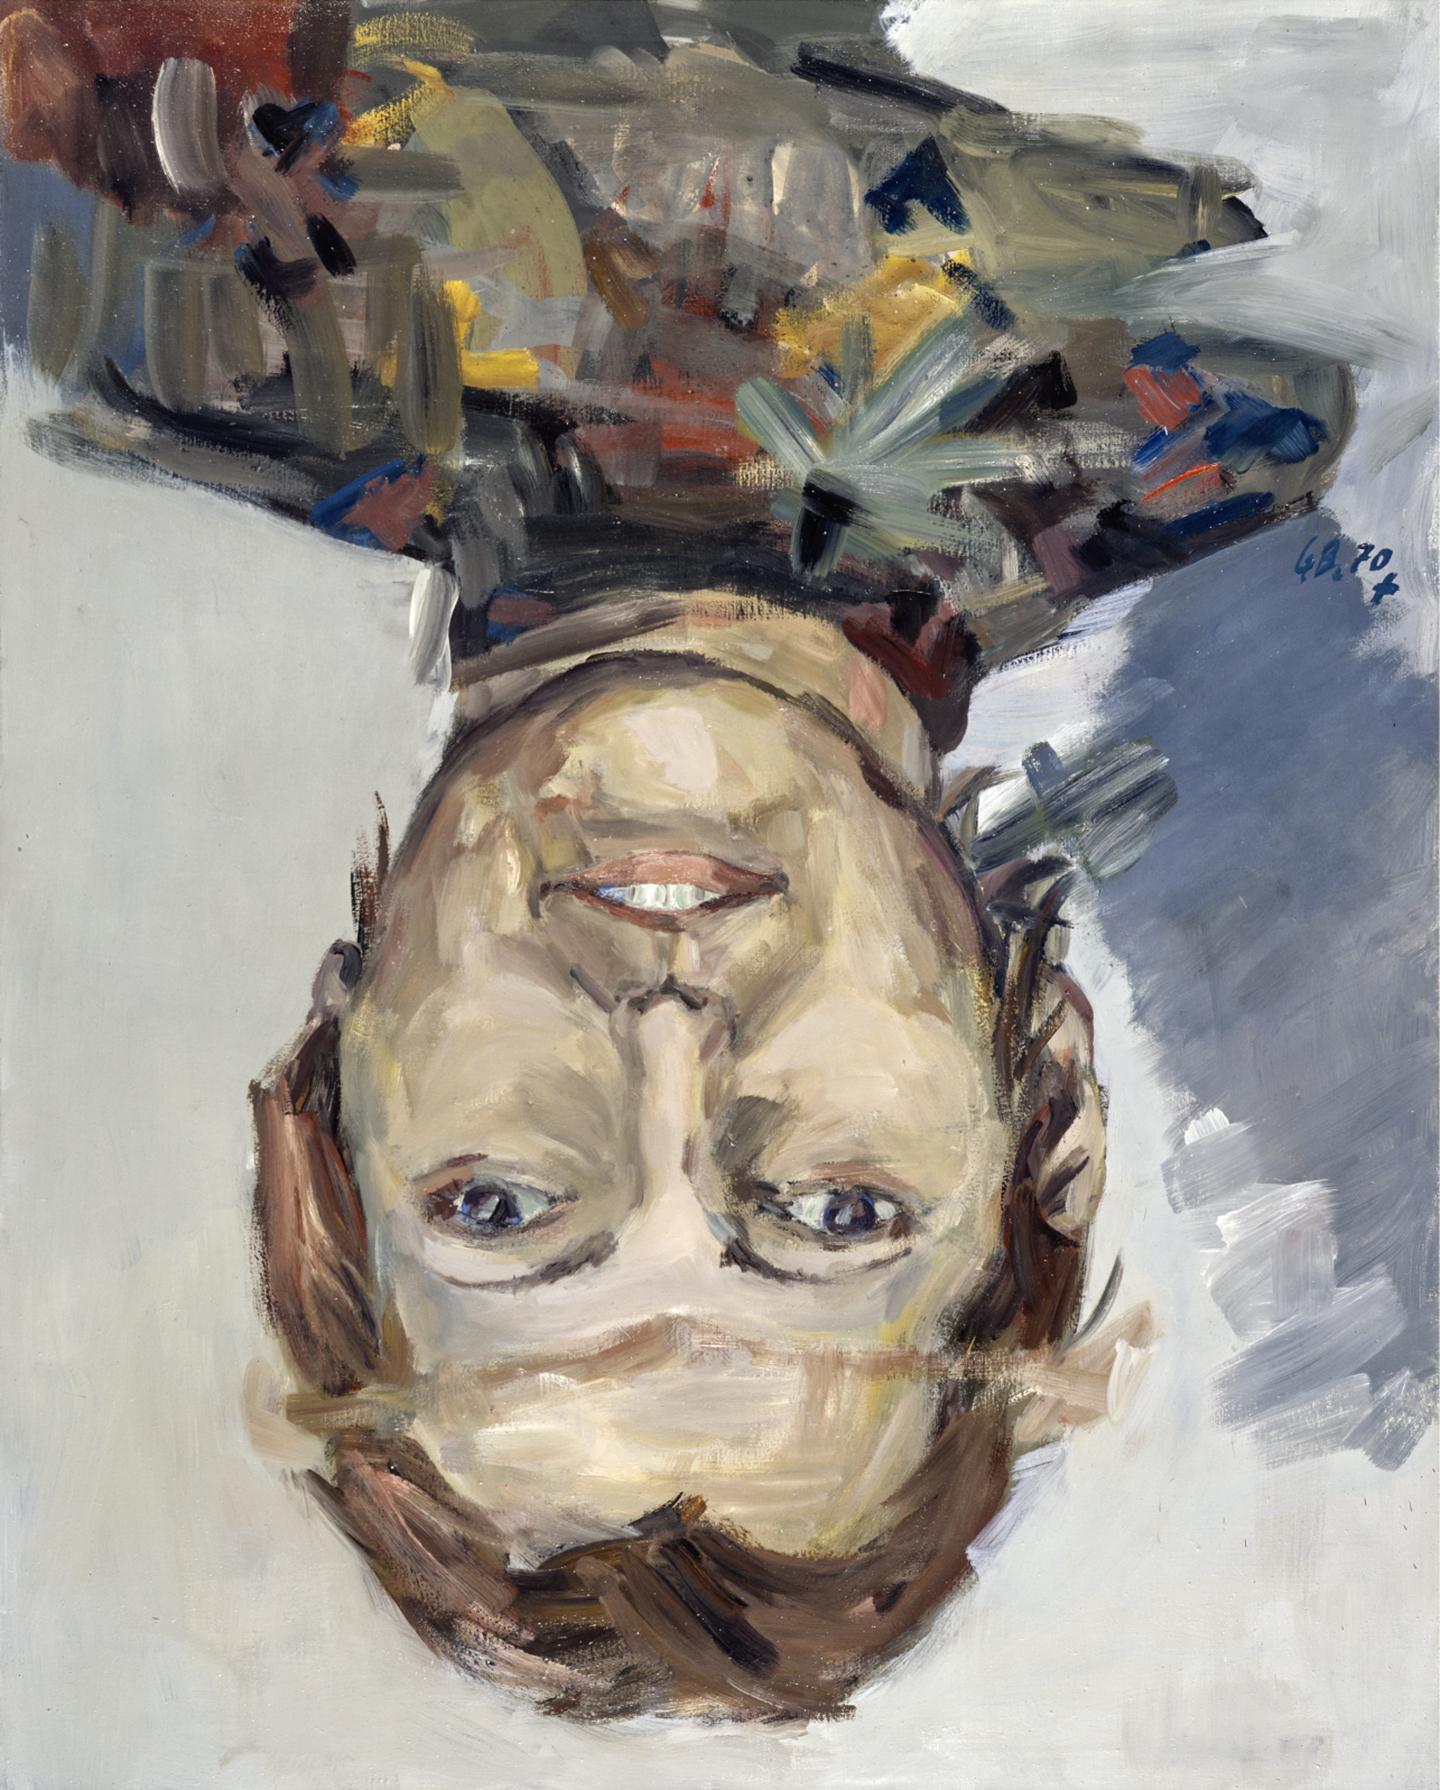 Georg Baselitz. Porträt Thordis Möller (Retrato de Thordis Möller), 1970